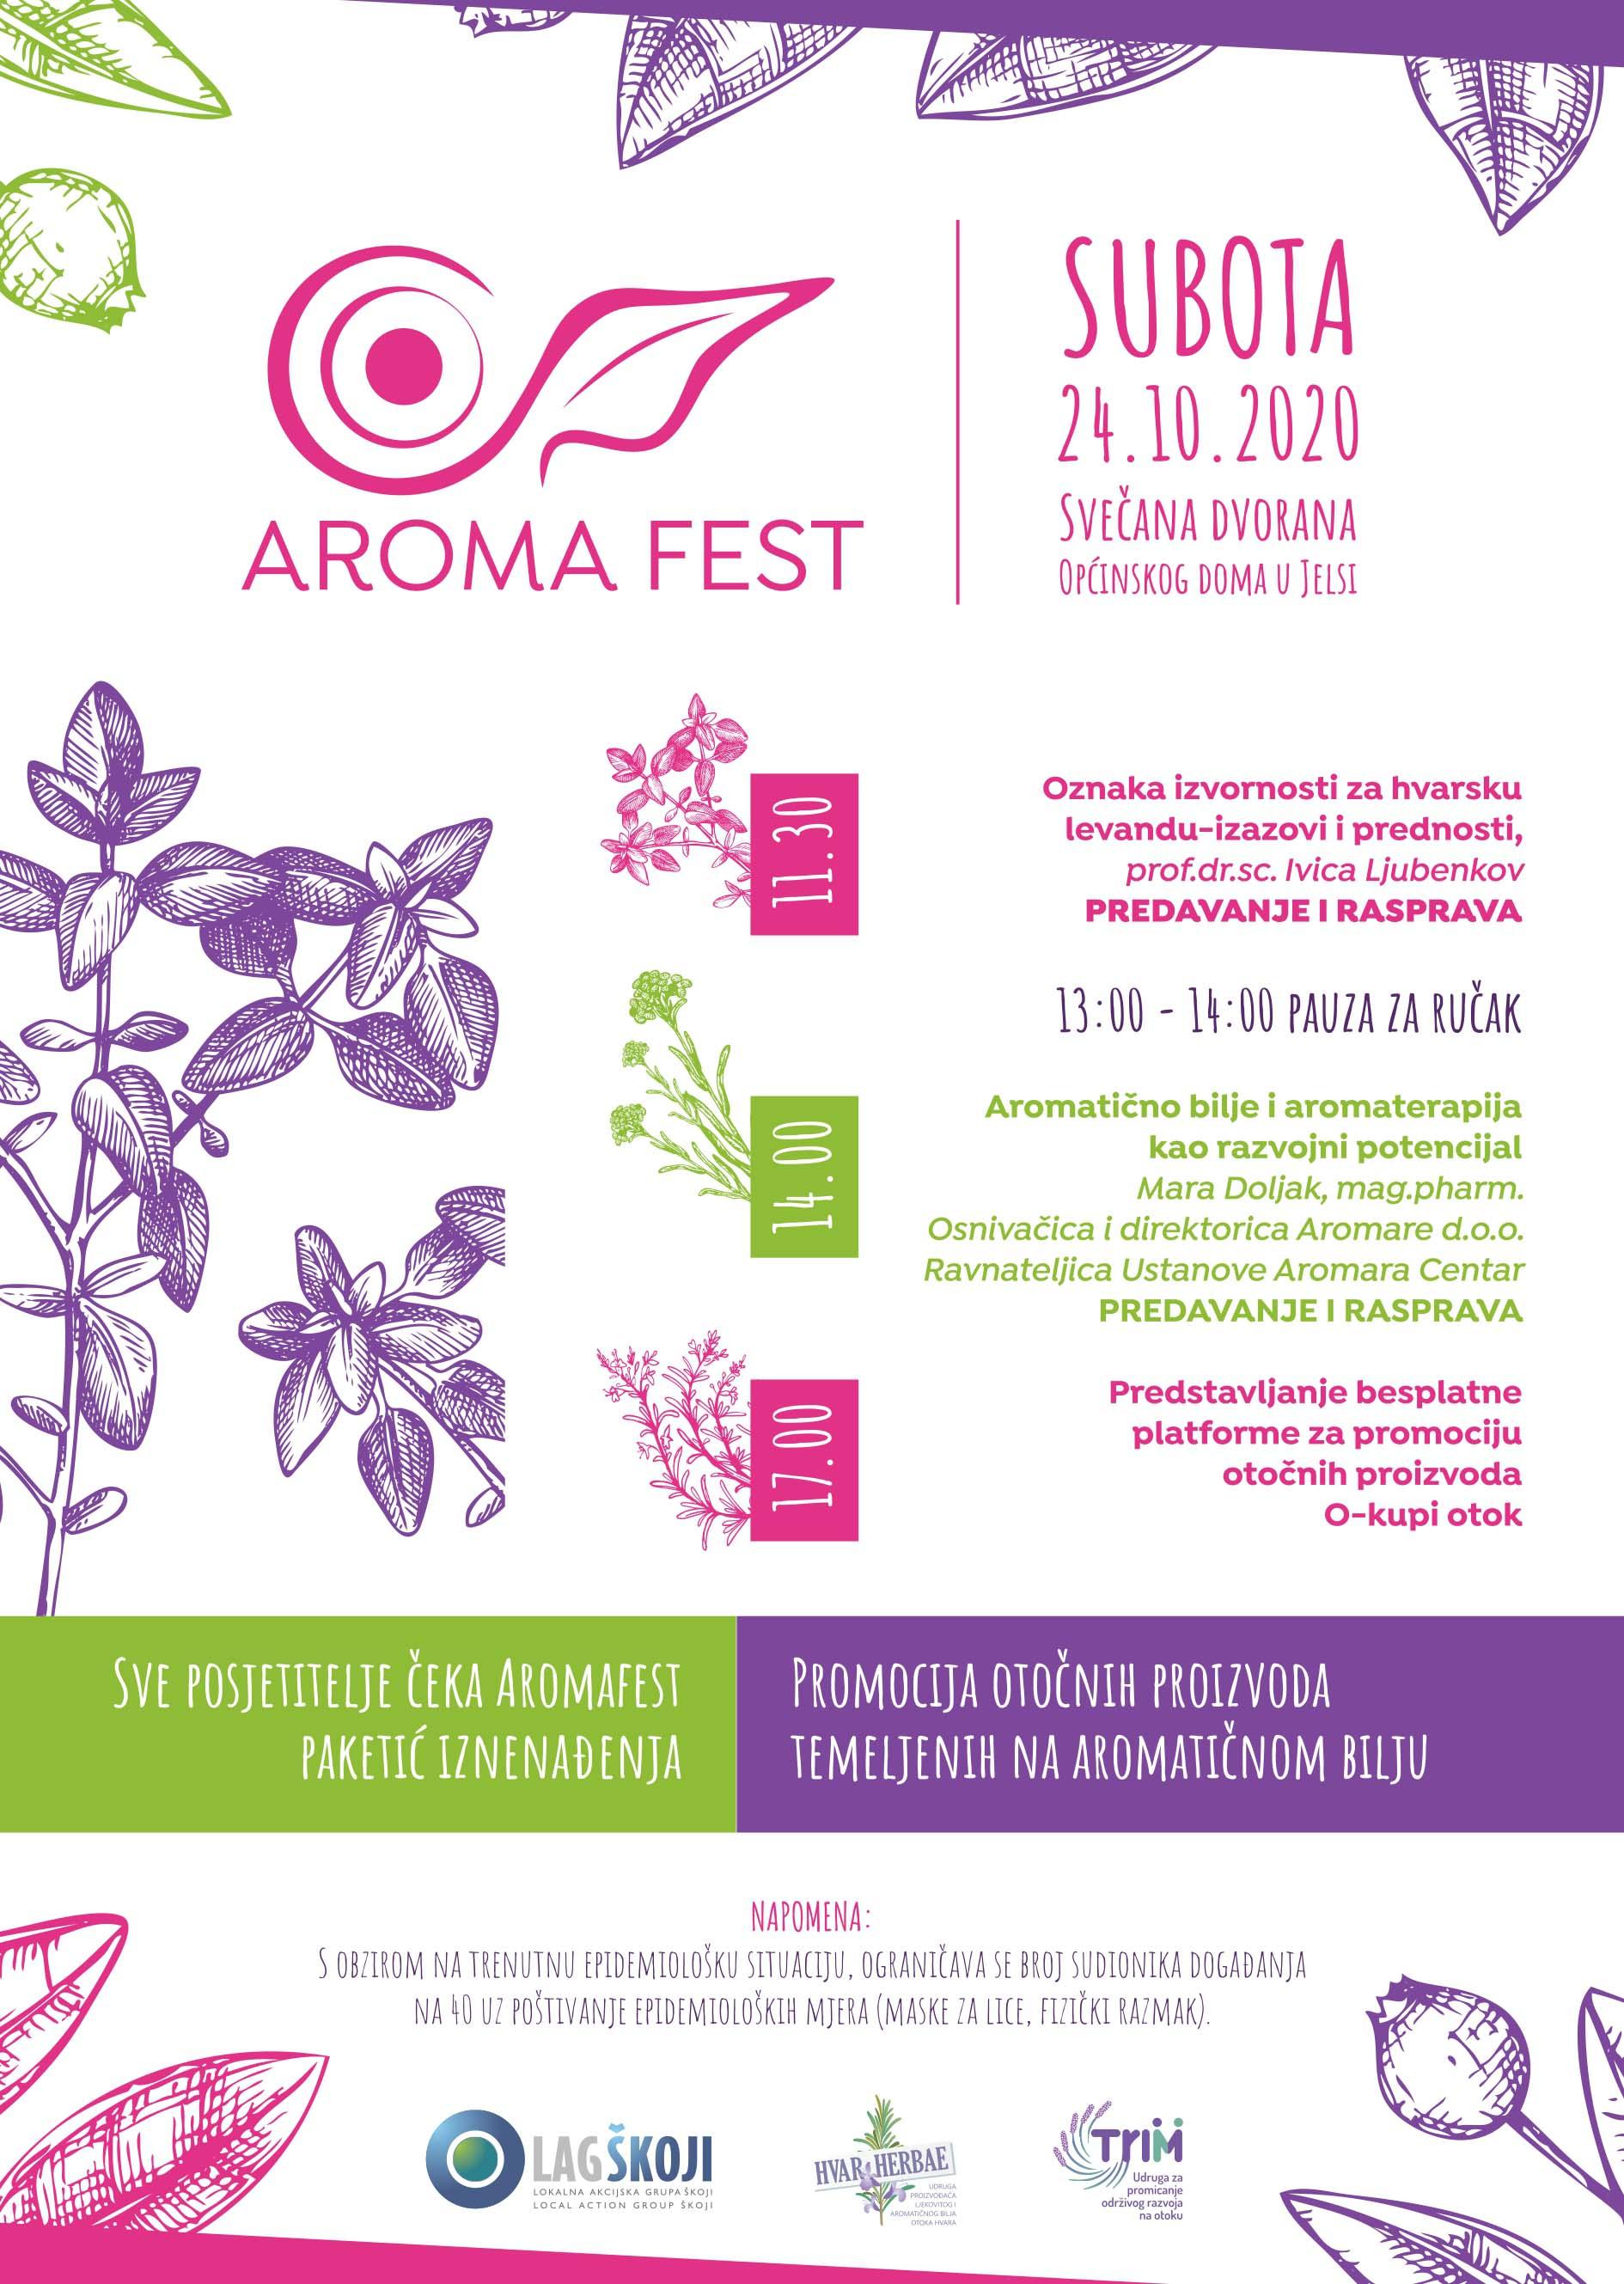 AROMA FEST 2020